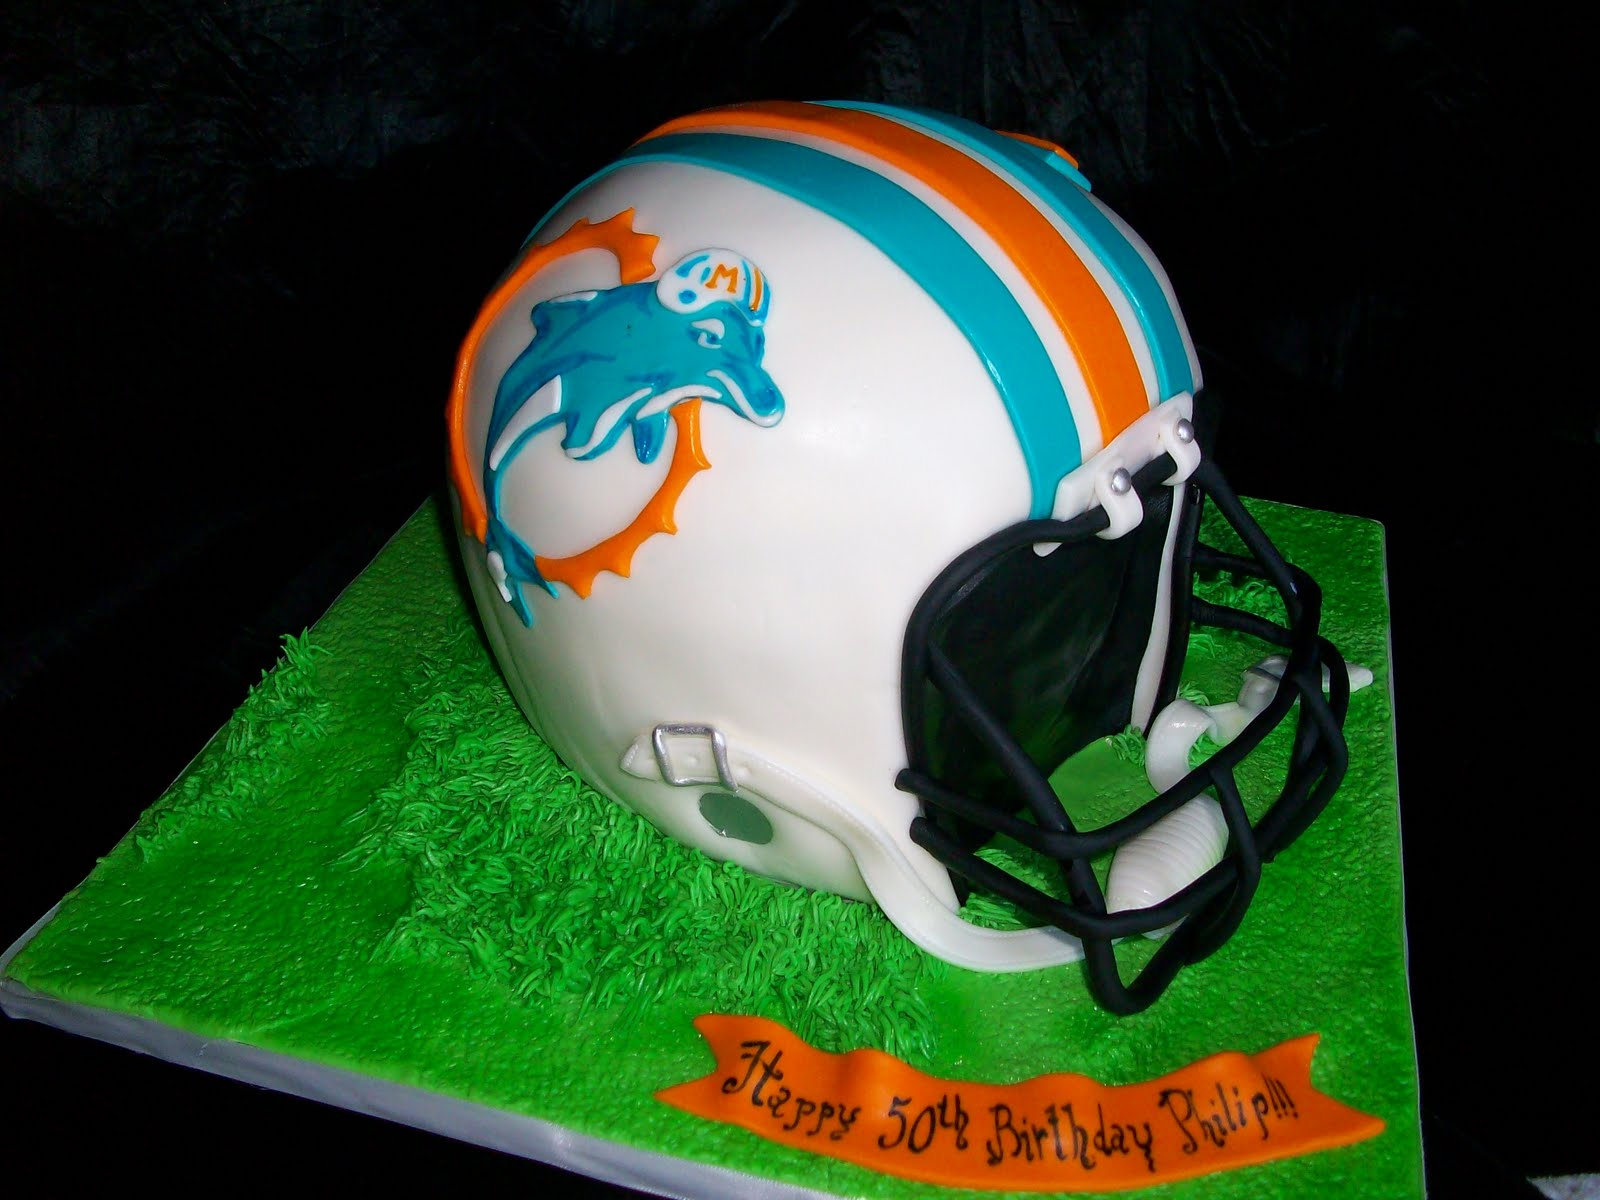 On Birthday Cakes Miami Dolphins Helmet Cake